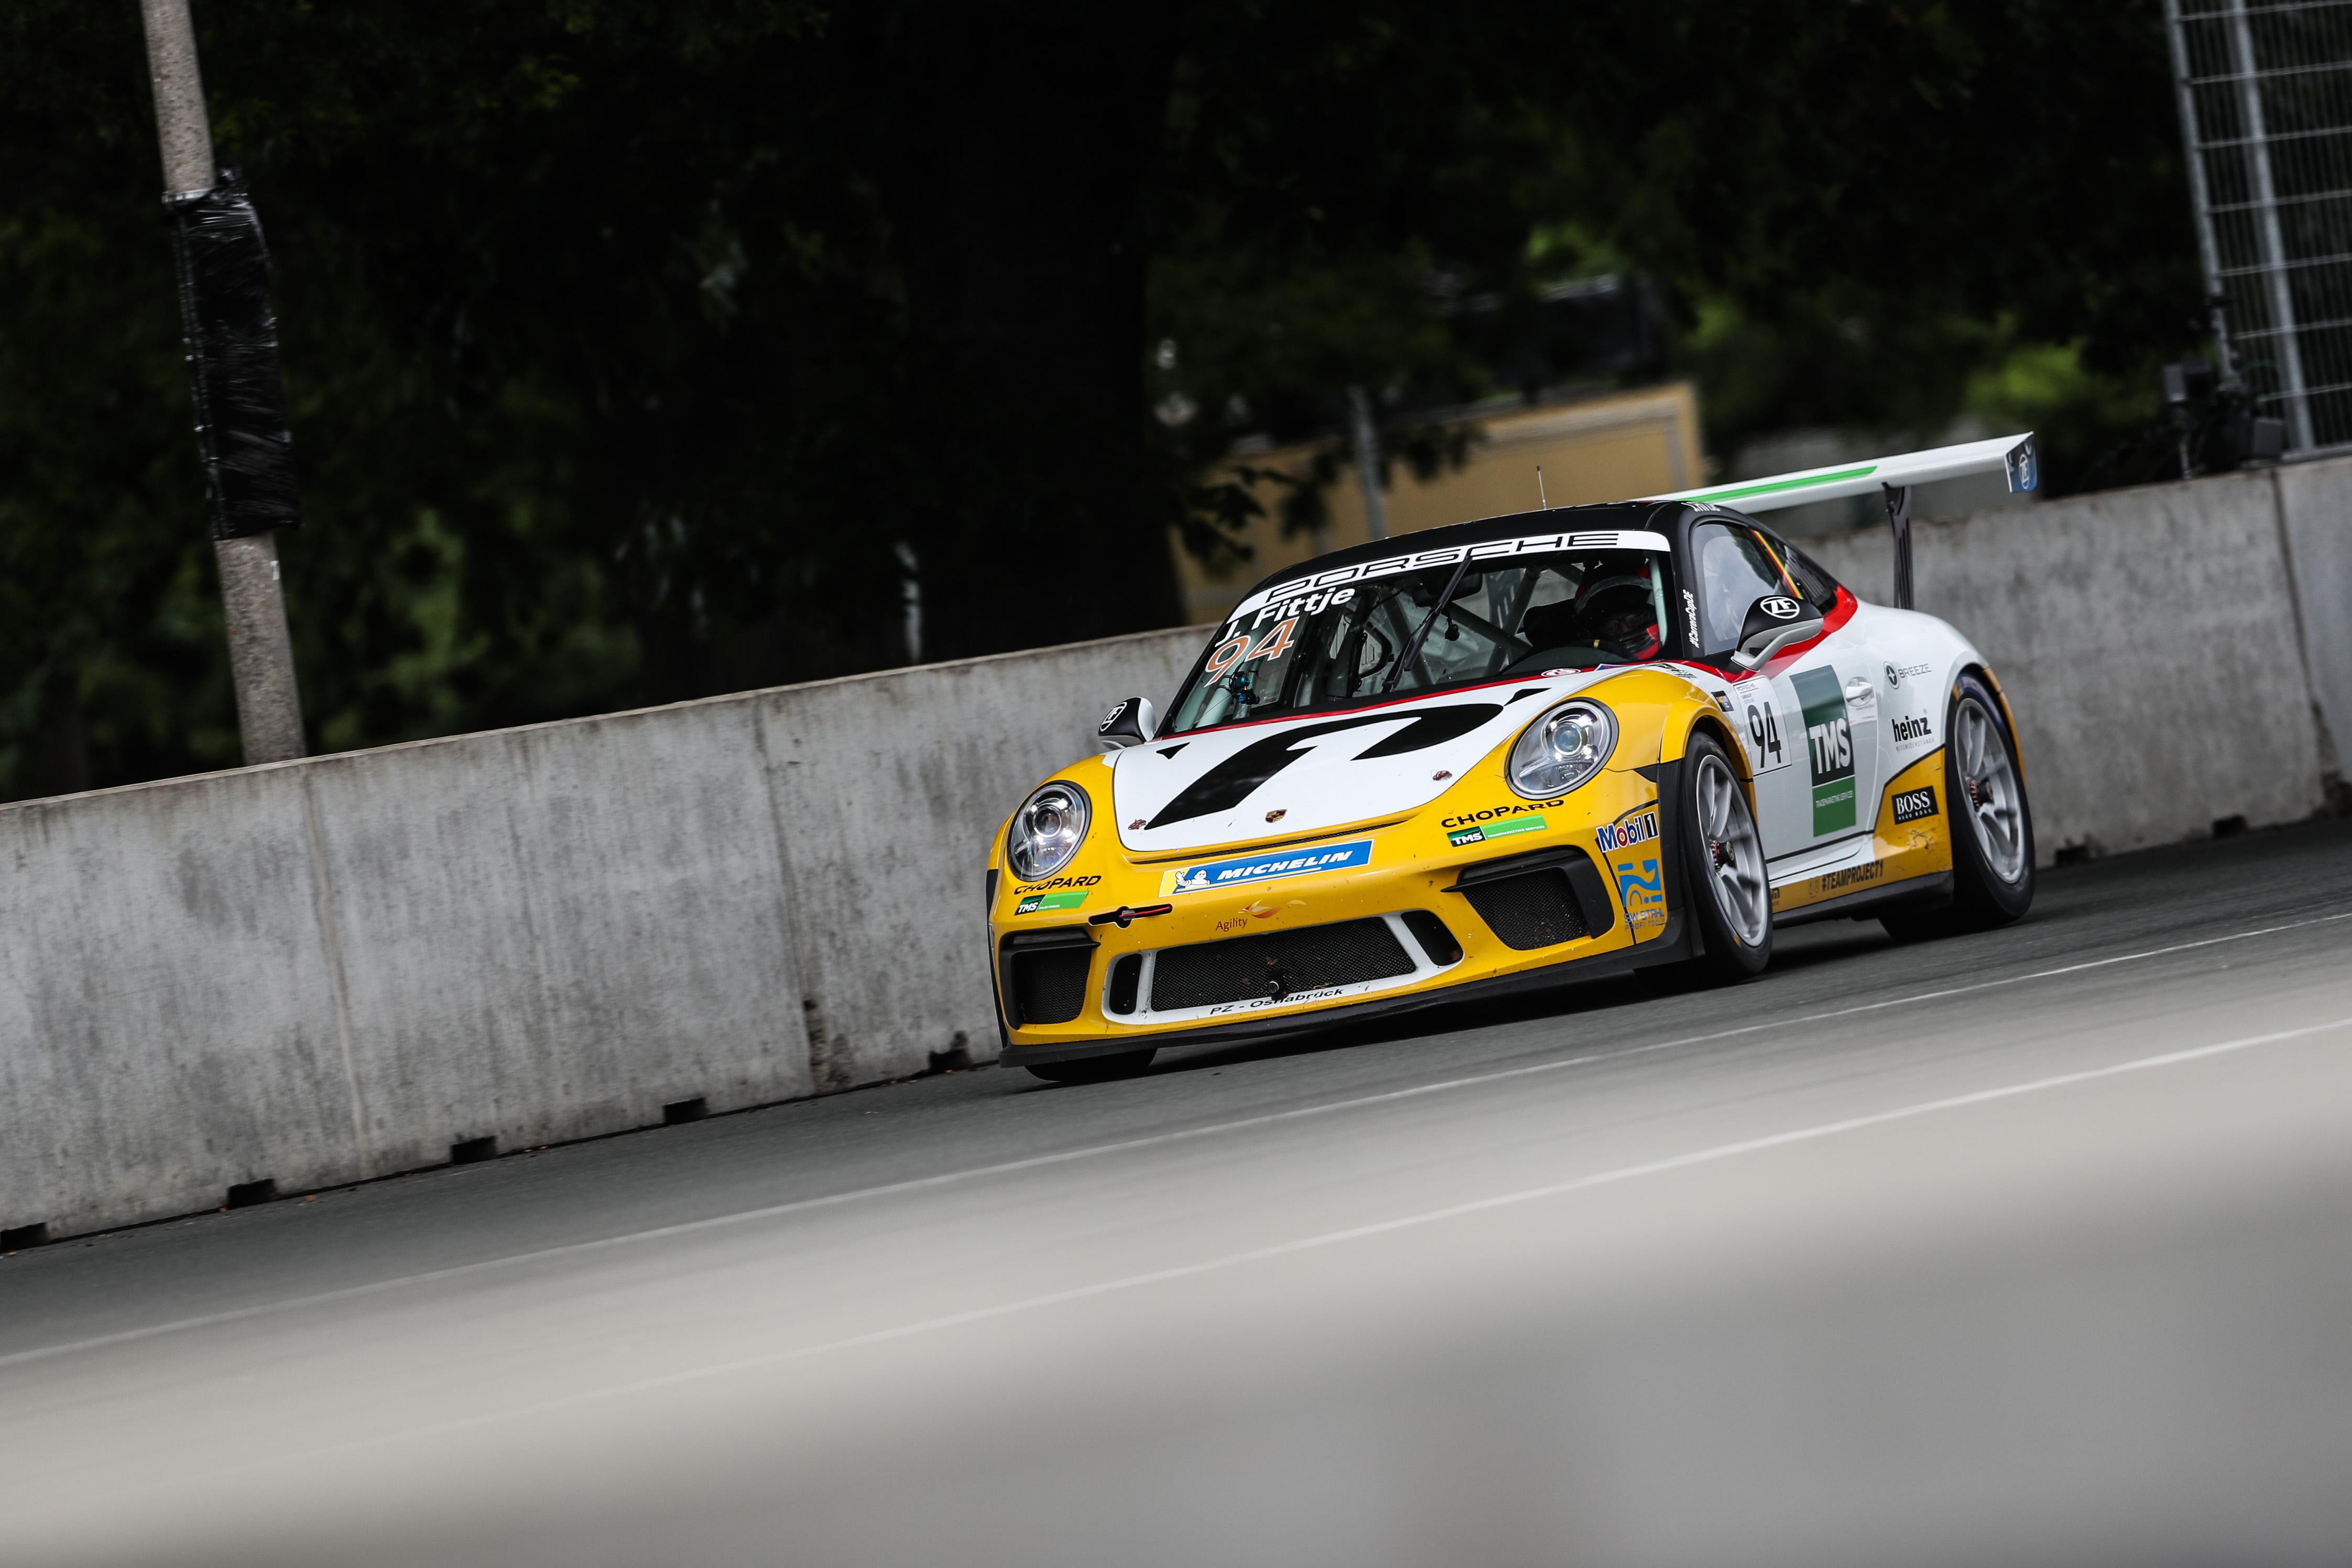 Porsche Carrera Cup Deutschland, 7. + 8. Lauf Norisring 2019 - Foto: Gruppe C Photography; #94 Porsche 911 GT3 Cup, Team Project 1 - JBR: Jannes Fittje